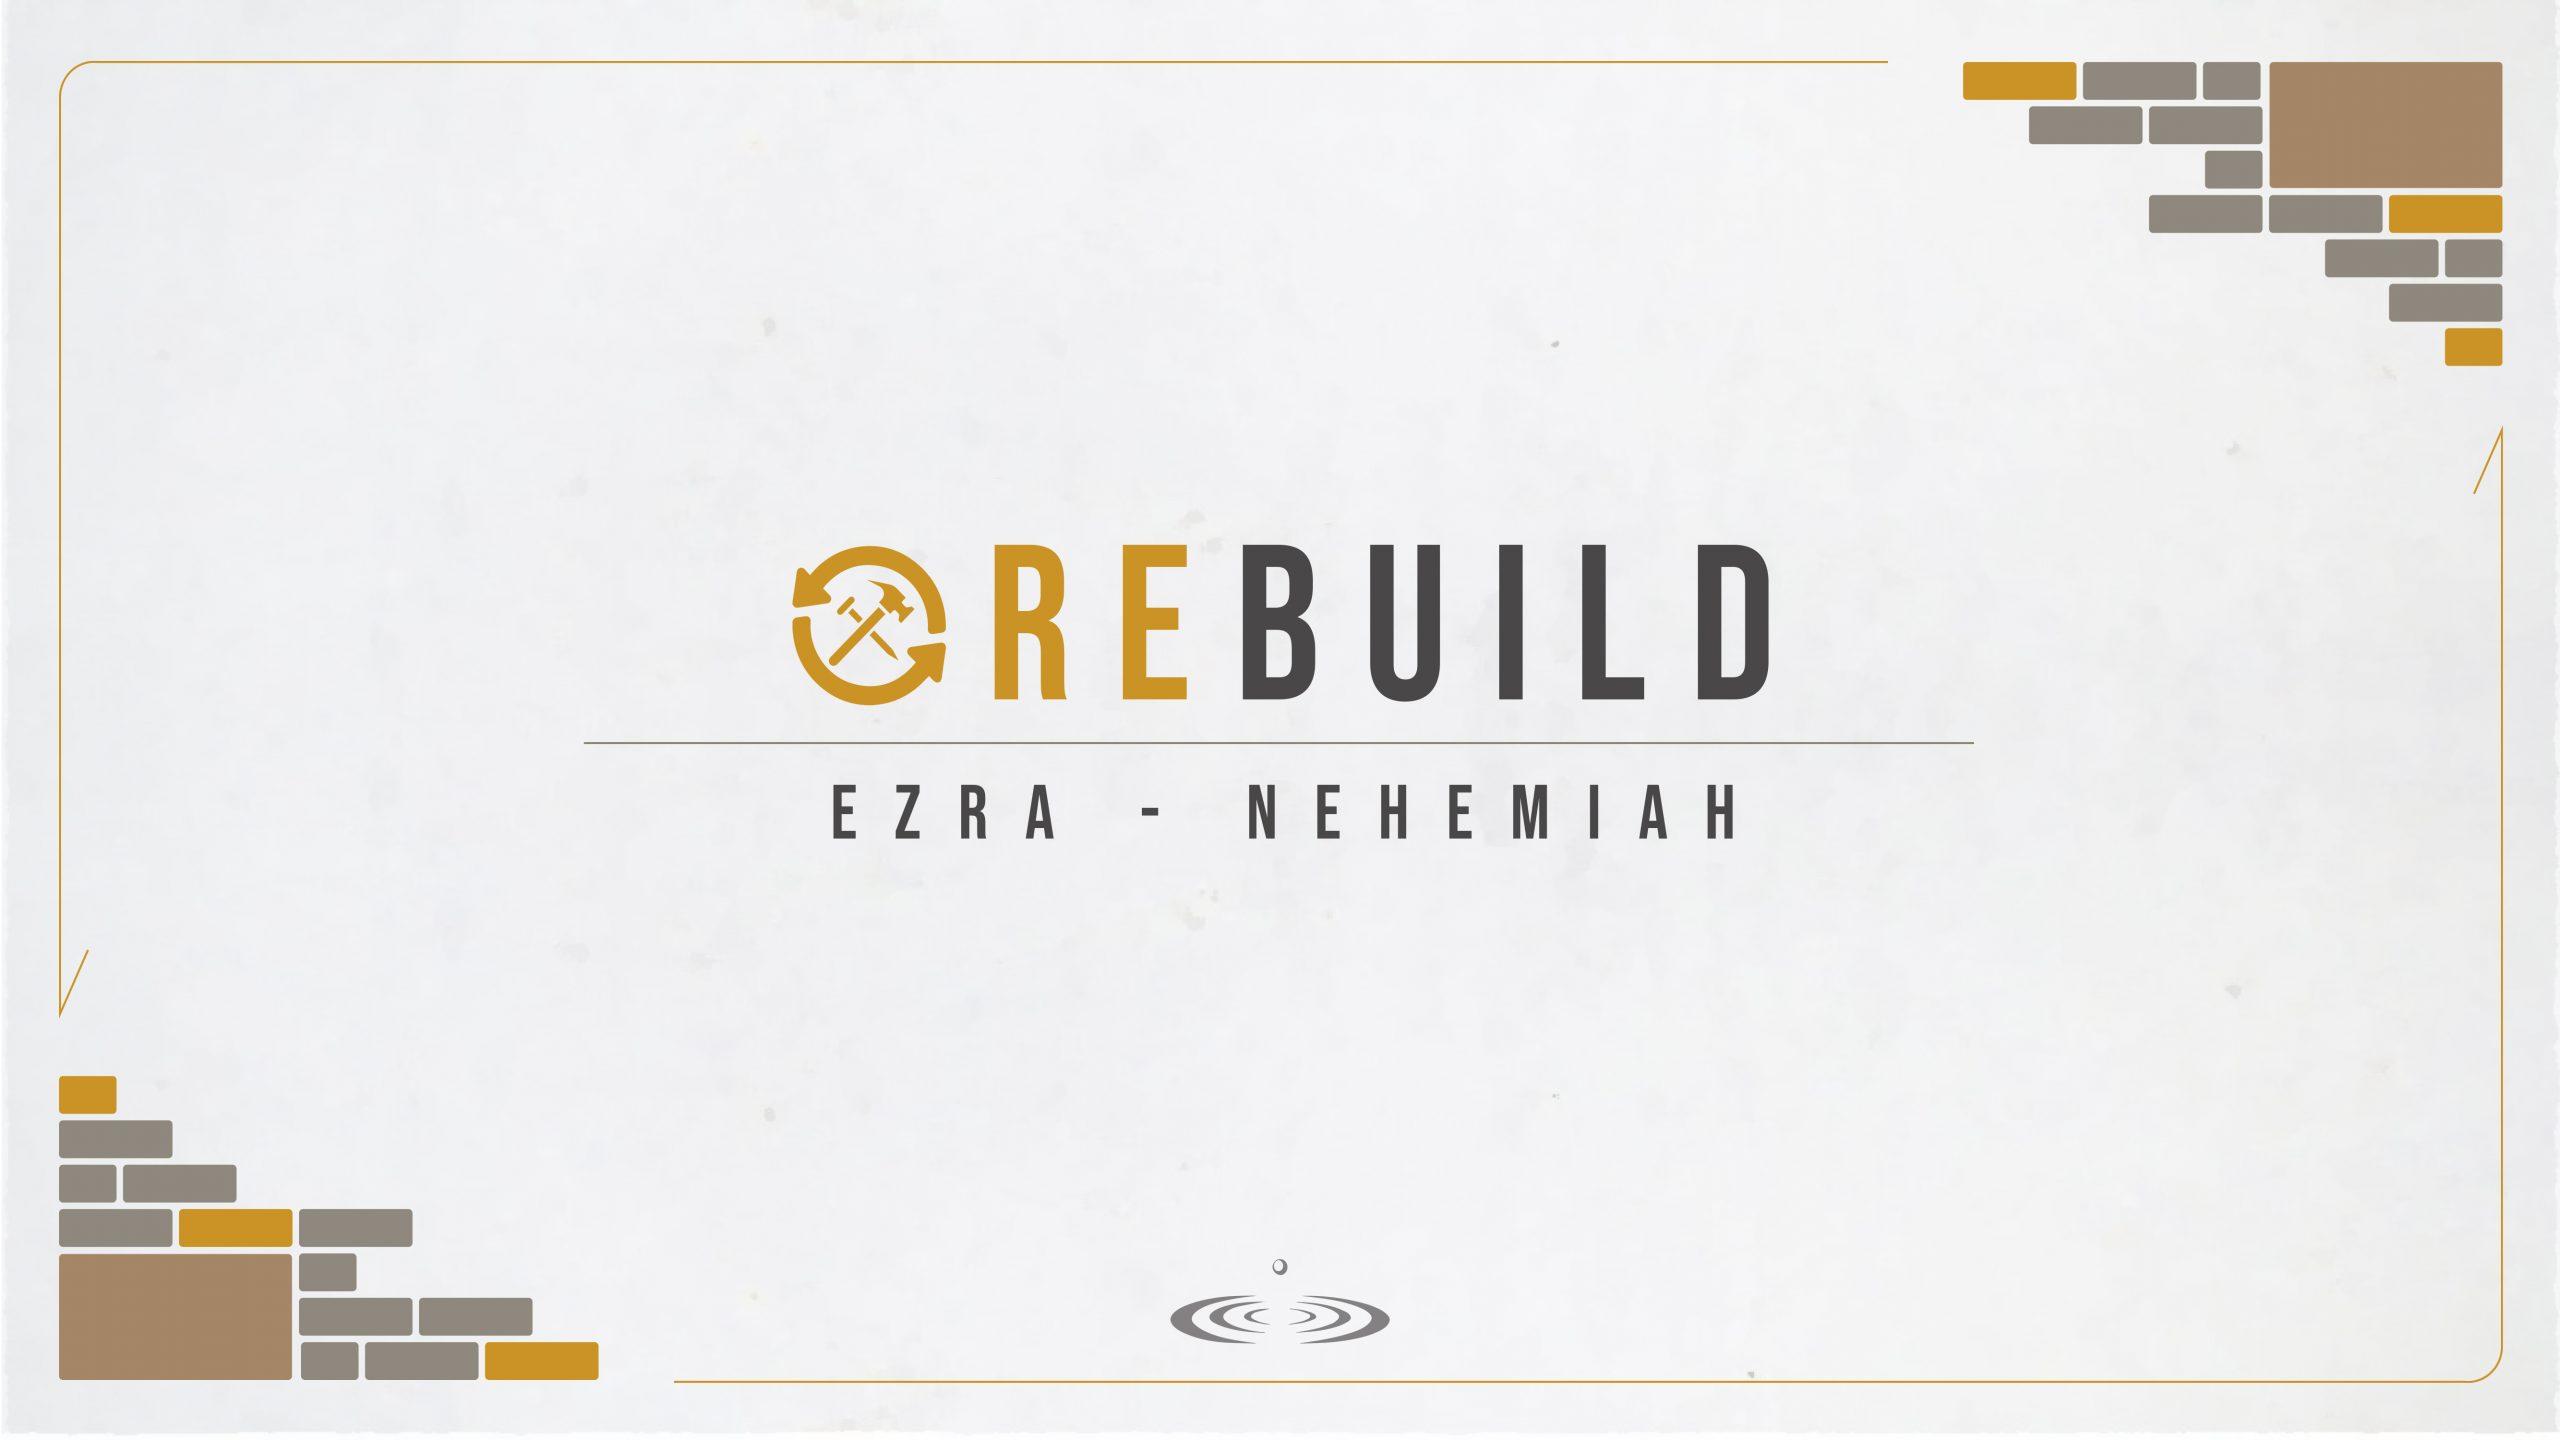 Rebuild – Part 5: A Reformed Generation